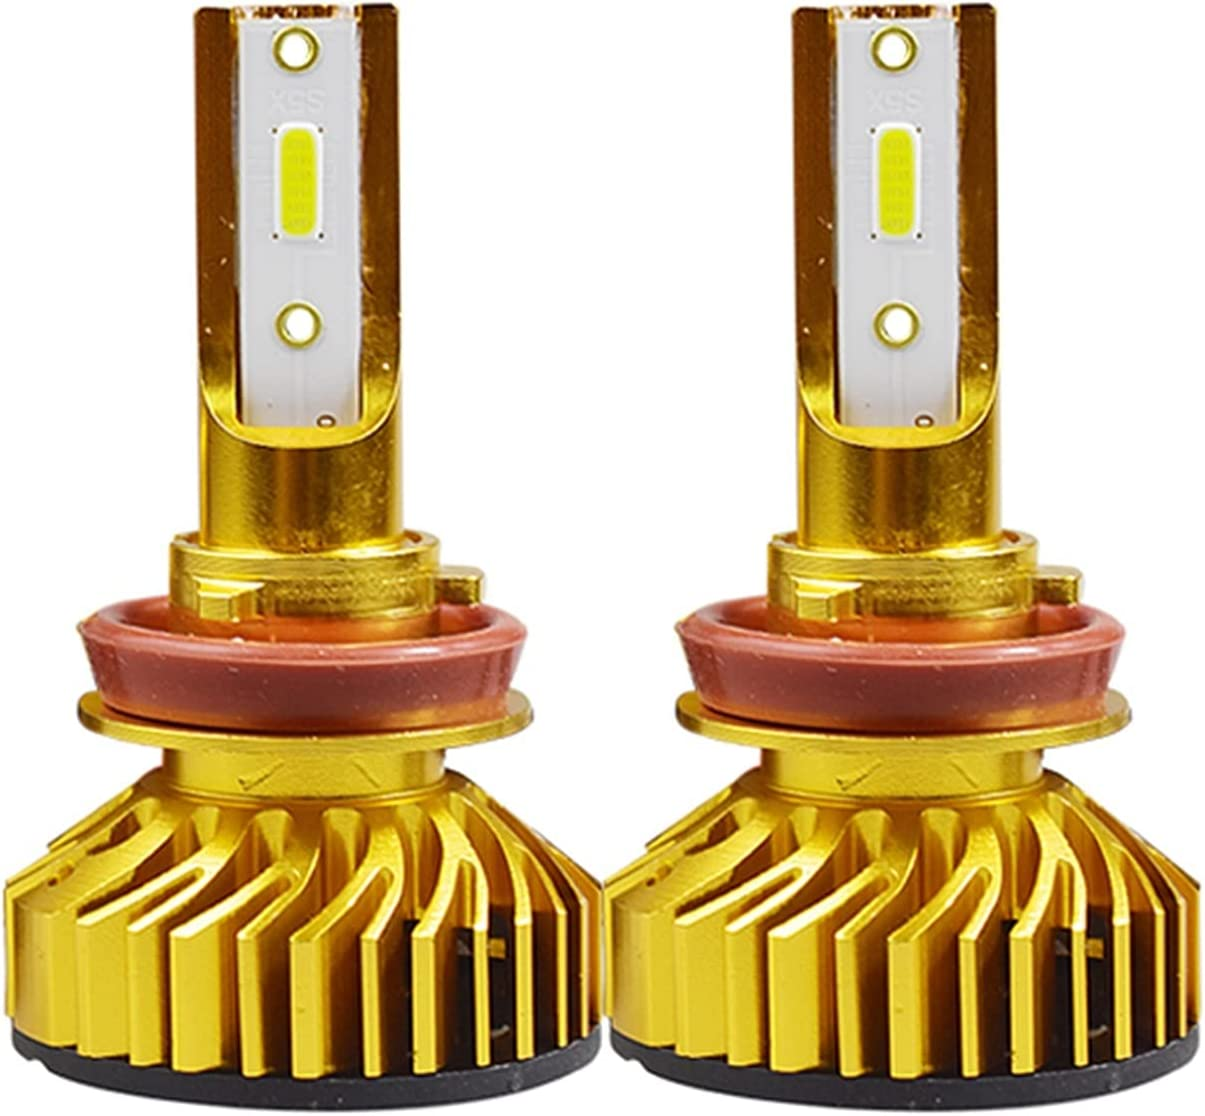 RH-HPC Faros LED Luz de Cabeza de Coche LED Ampolla H7 H4 LED H1 H119006 9005 HB3 HB4 9012 HIR2 72W 10000LM 6500K 12V 24V Auto Faro Bulbo Llevado (Socket Type : 9006/HB4)